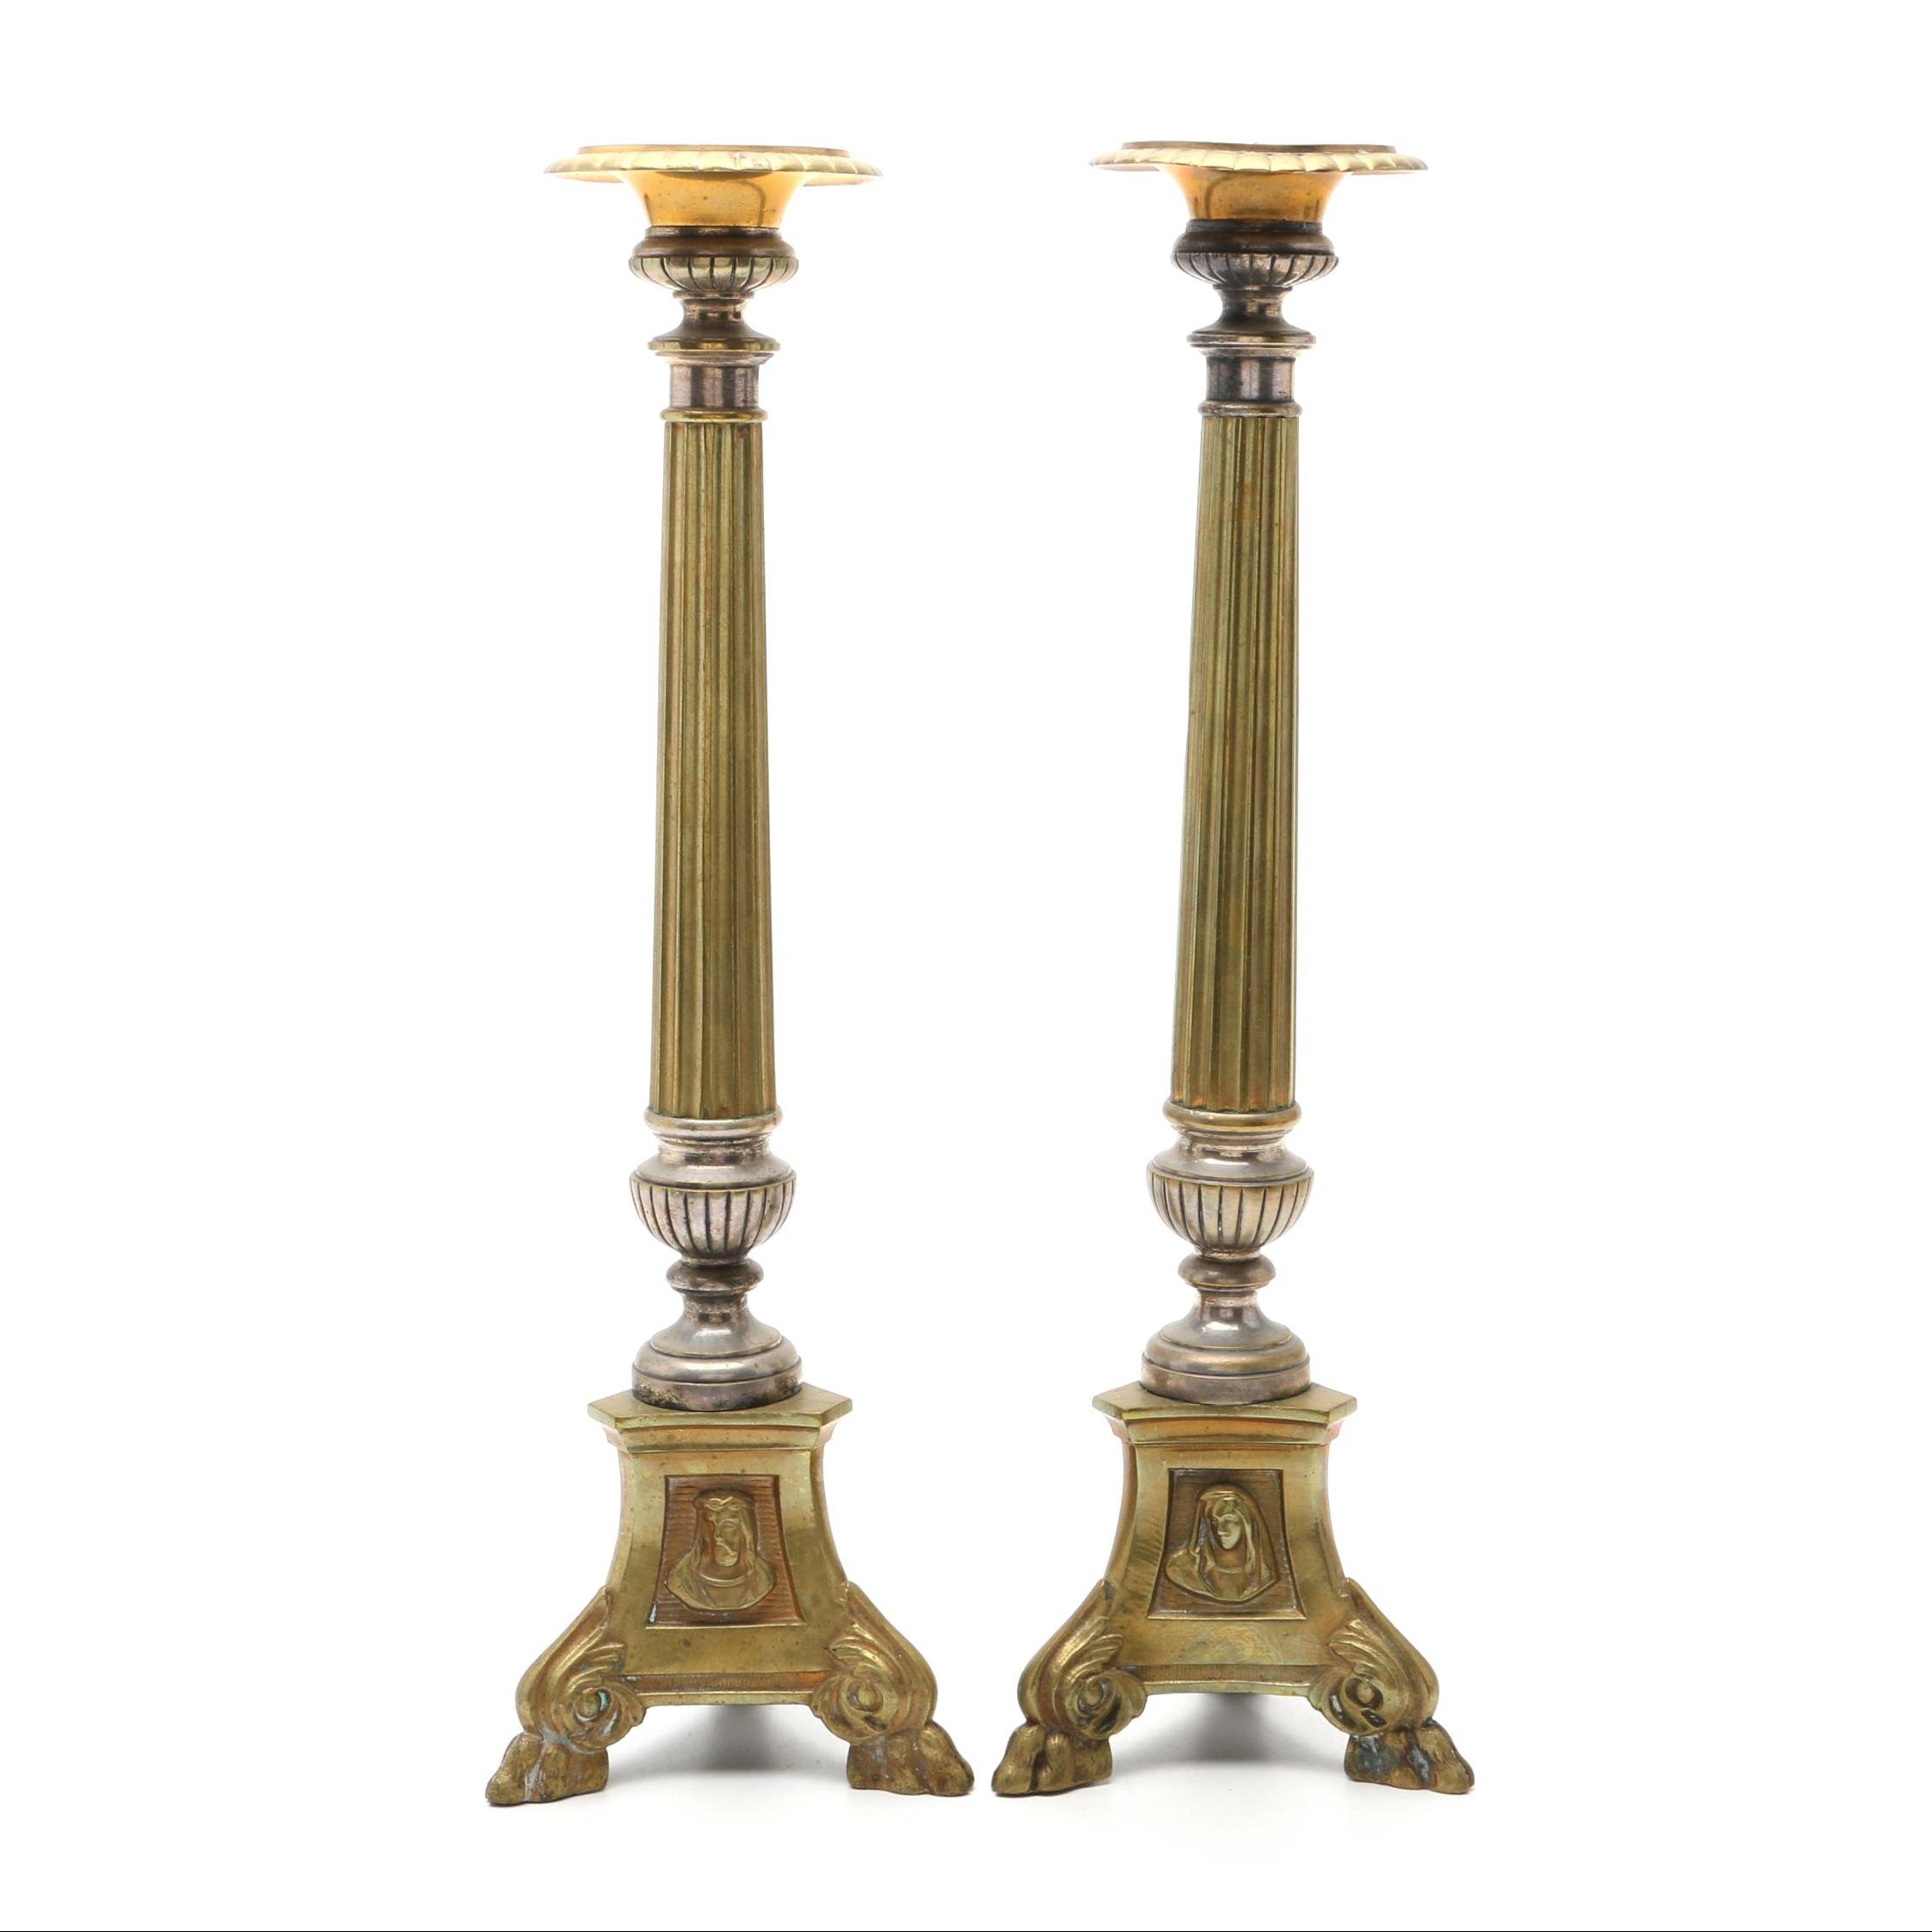 Circa 1900 French Renaissance Style Brass Pricket Candlesticks